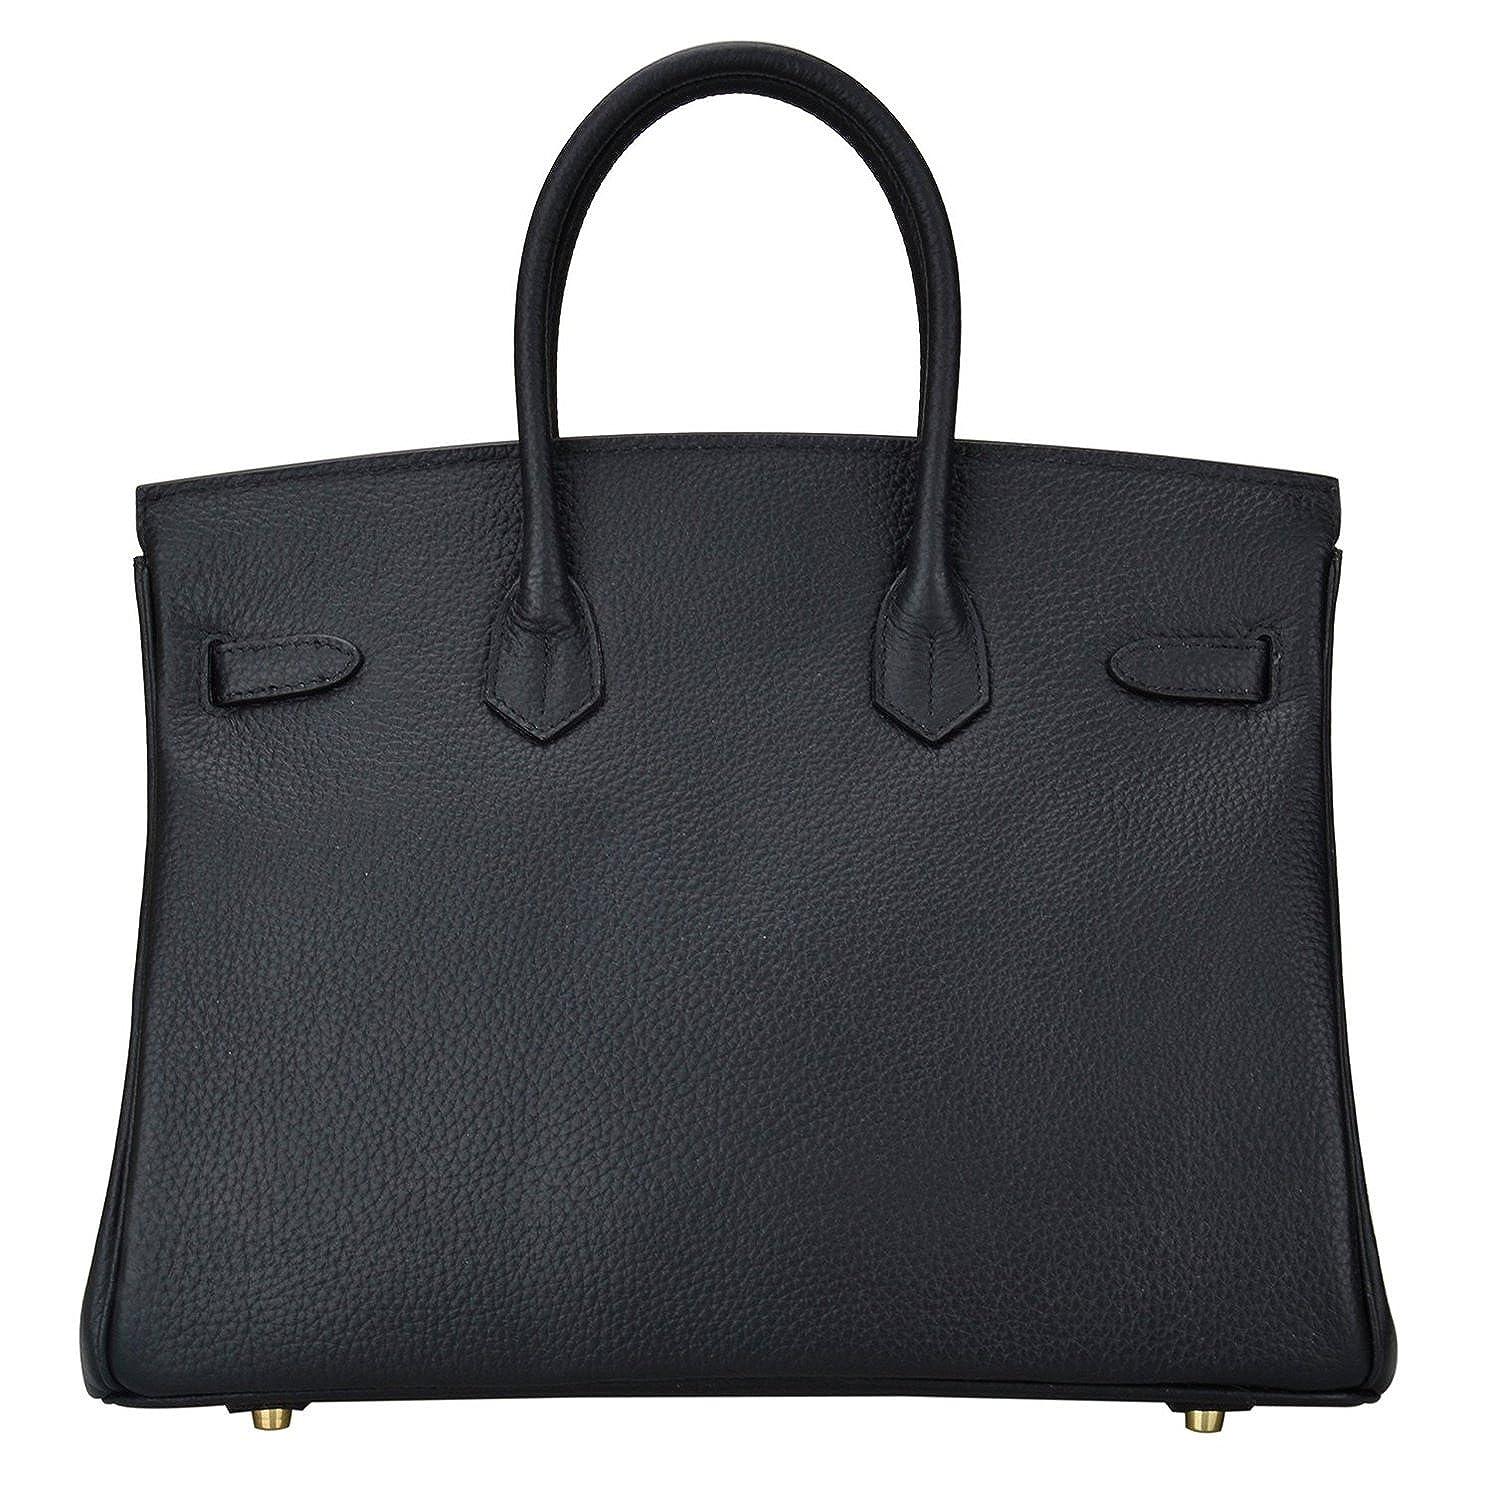 Ainifeel Women s Genuine Leather Padlock Handbags With Gold Hardware ... 12d6a100b6f